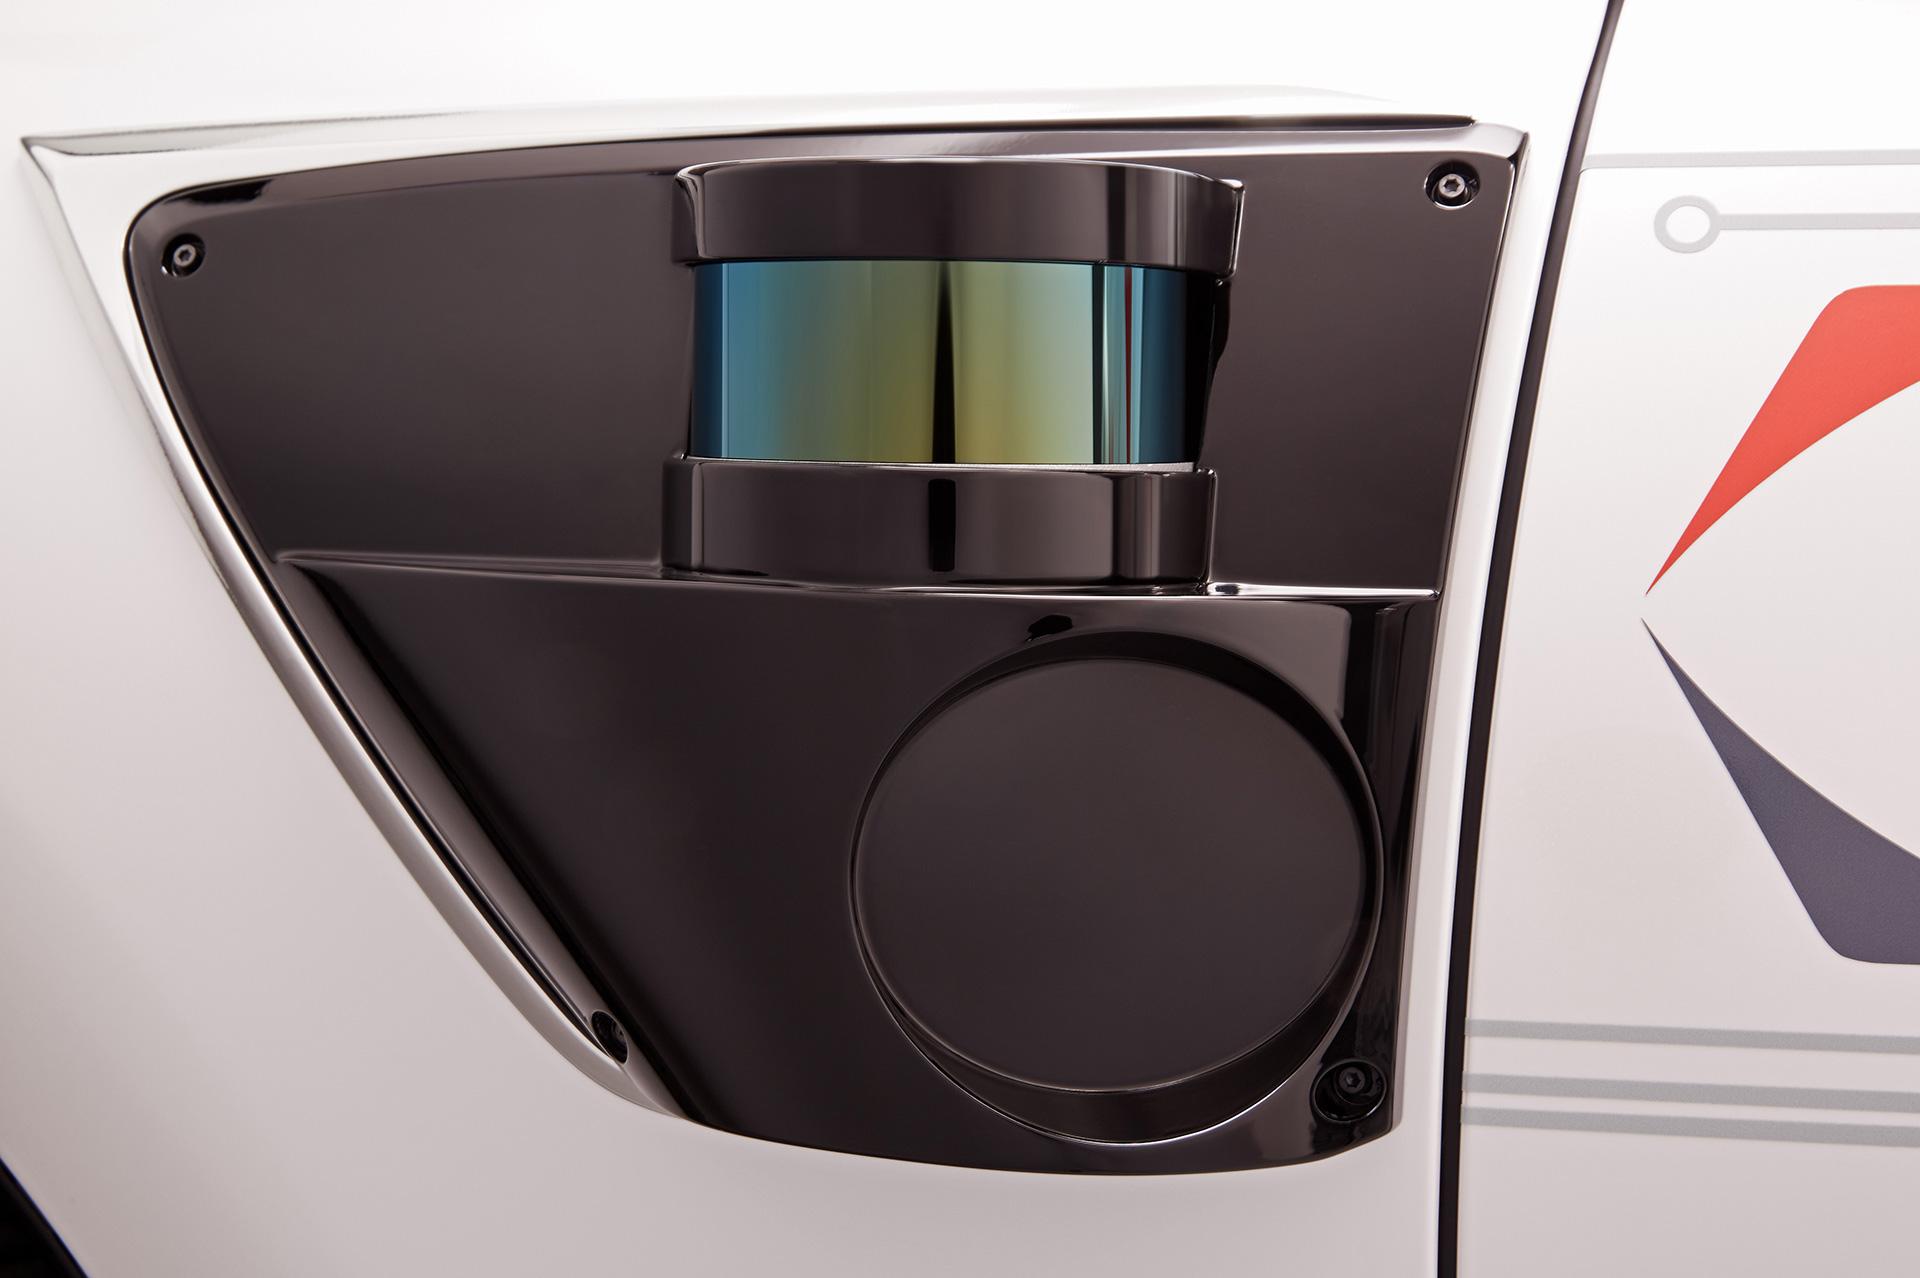 「【CES 2019】新型レクサスLSをベースとした自動運転実験車「TRI-P4」を披露」の4枚目の画像